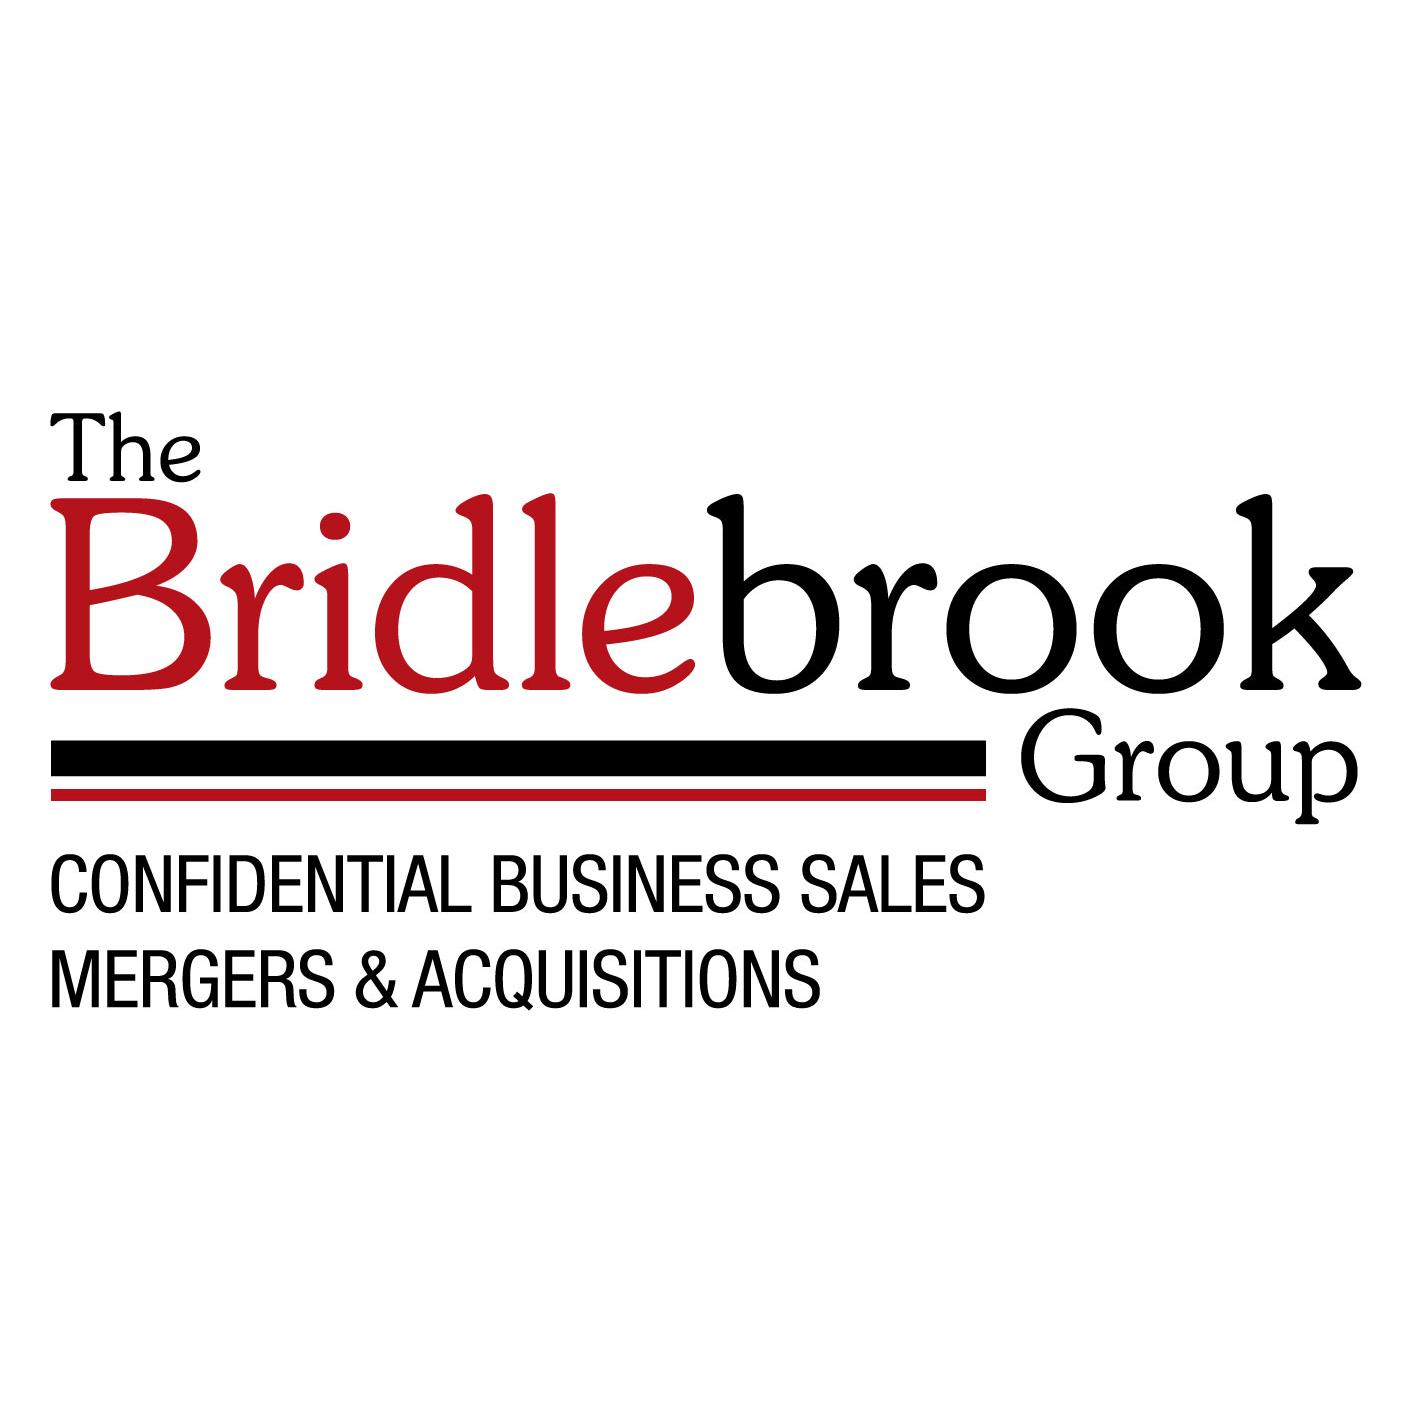 The Bridlebrook Group image 1